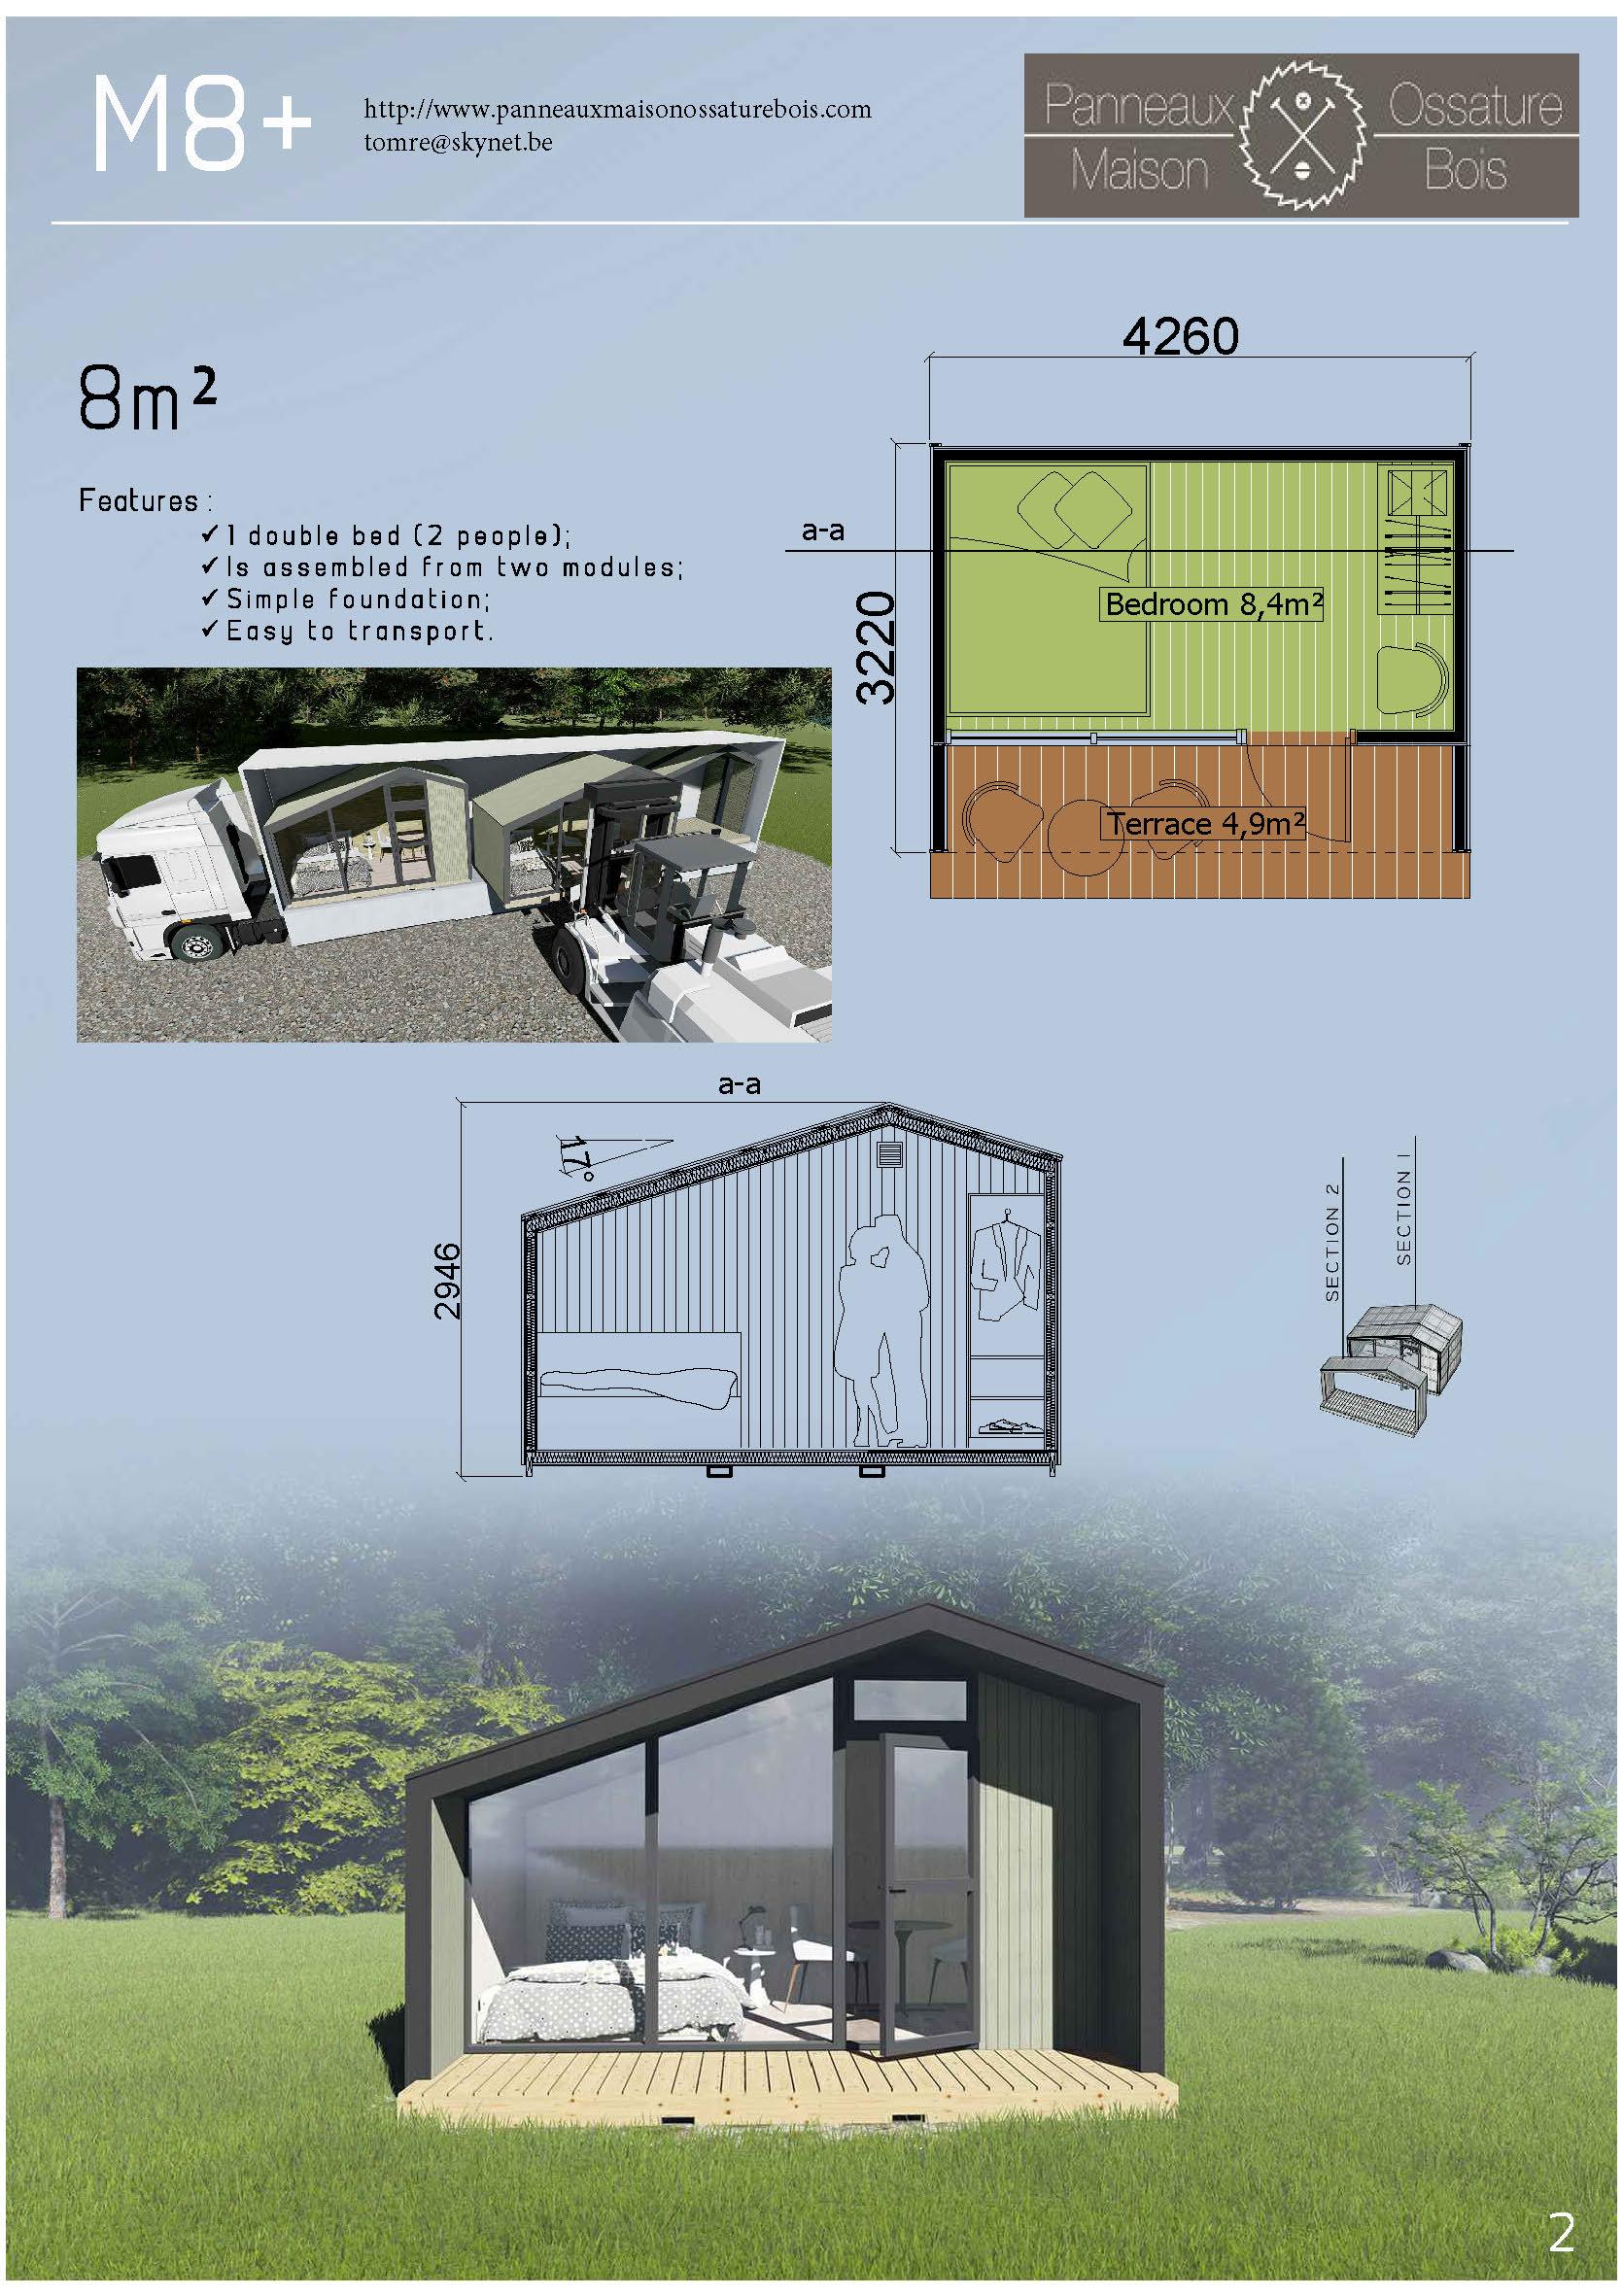 M-cabin brochure 01_Page_02